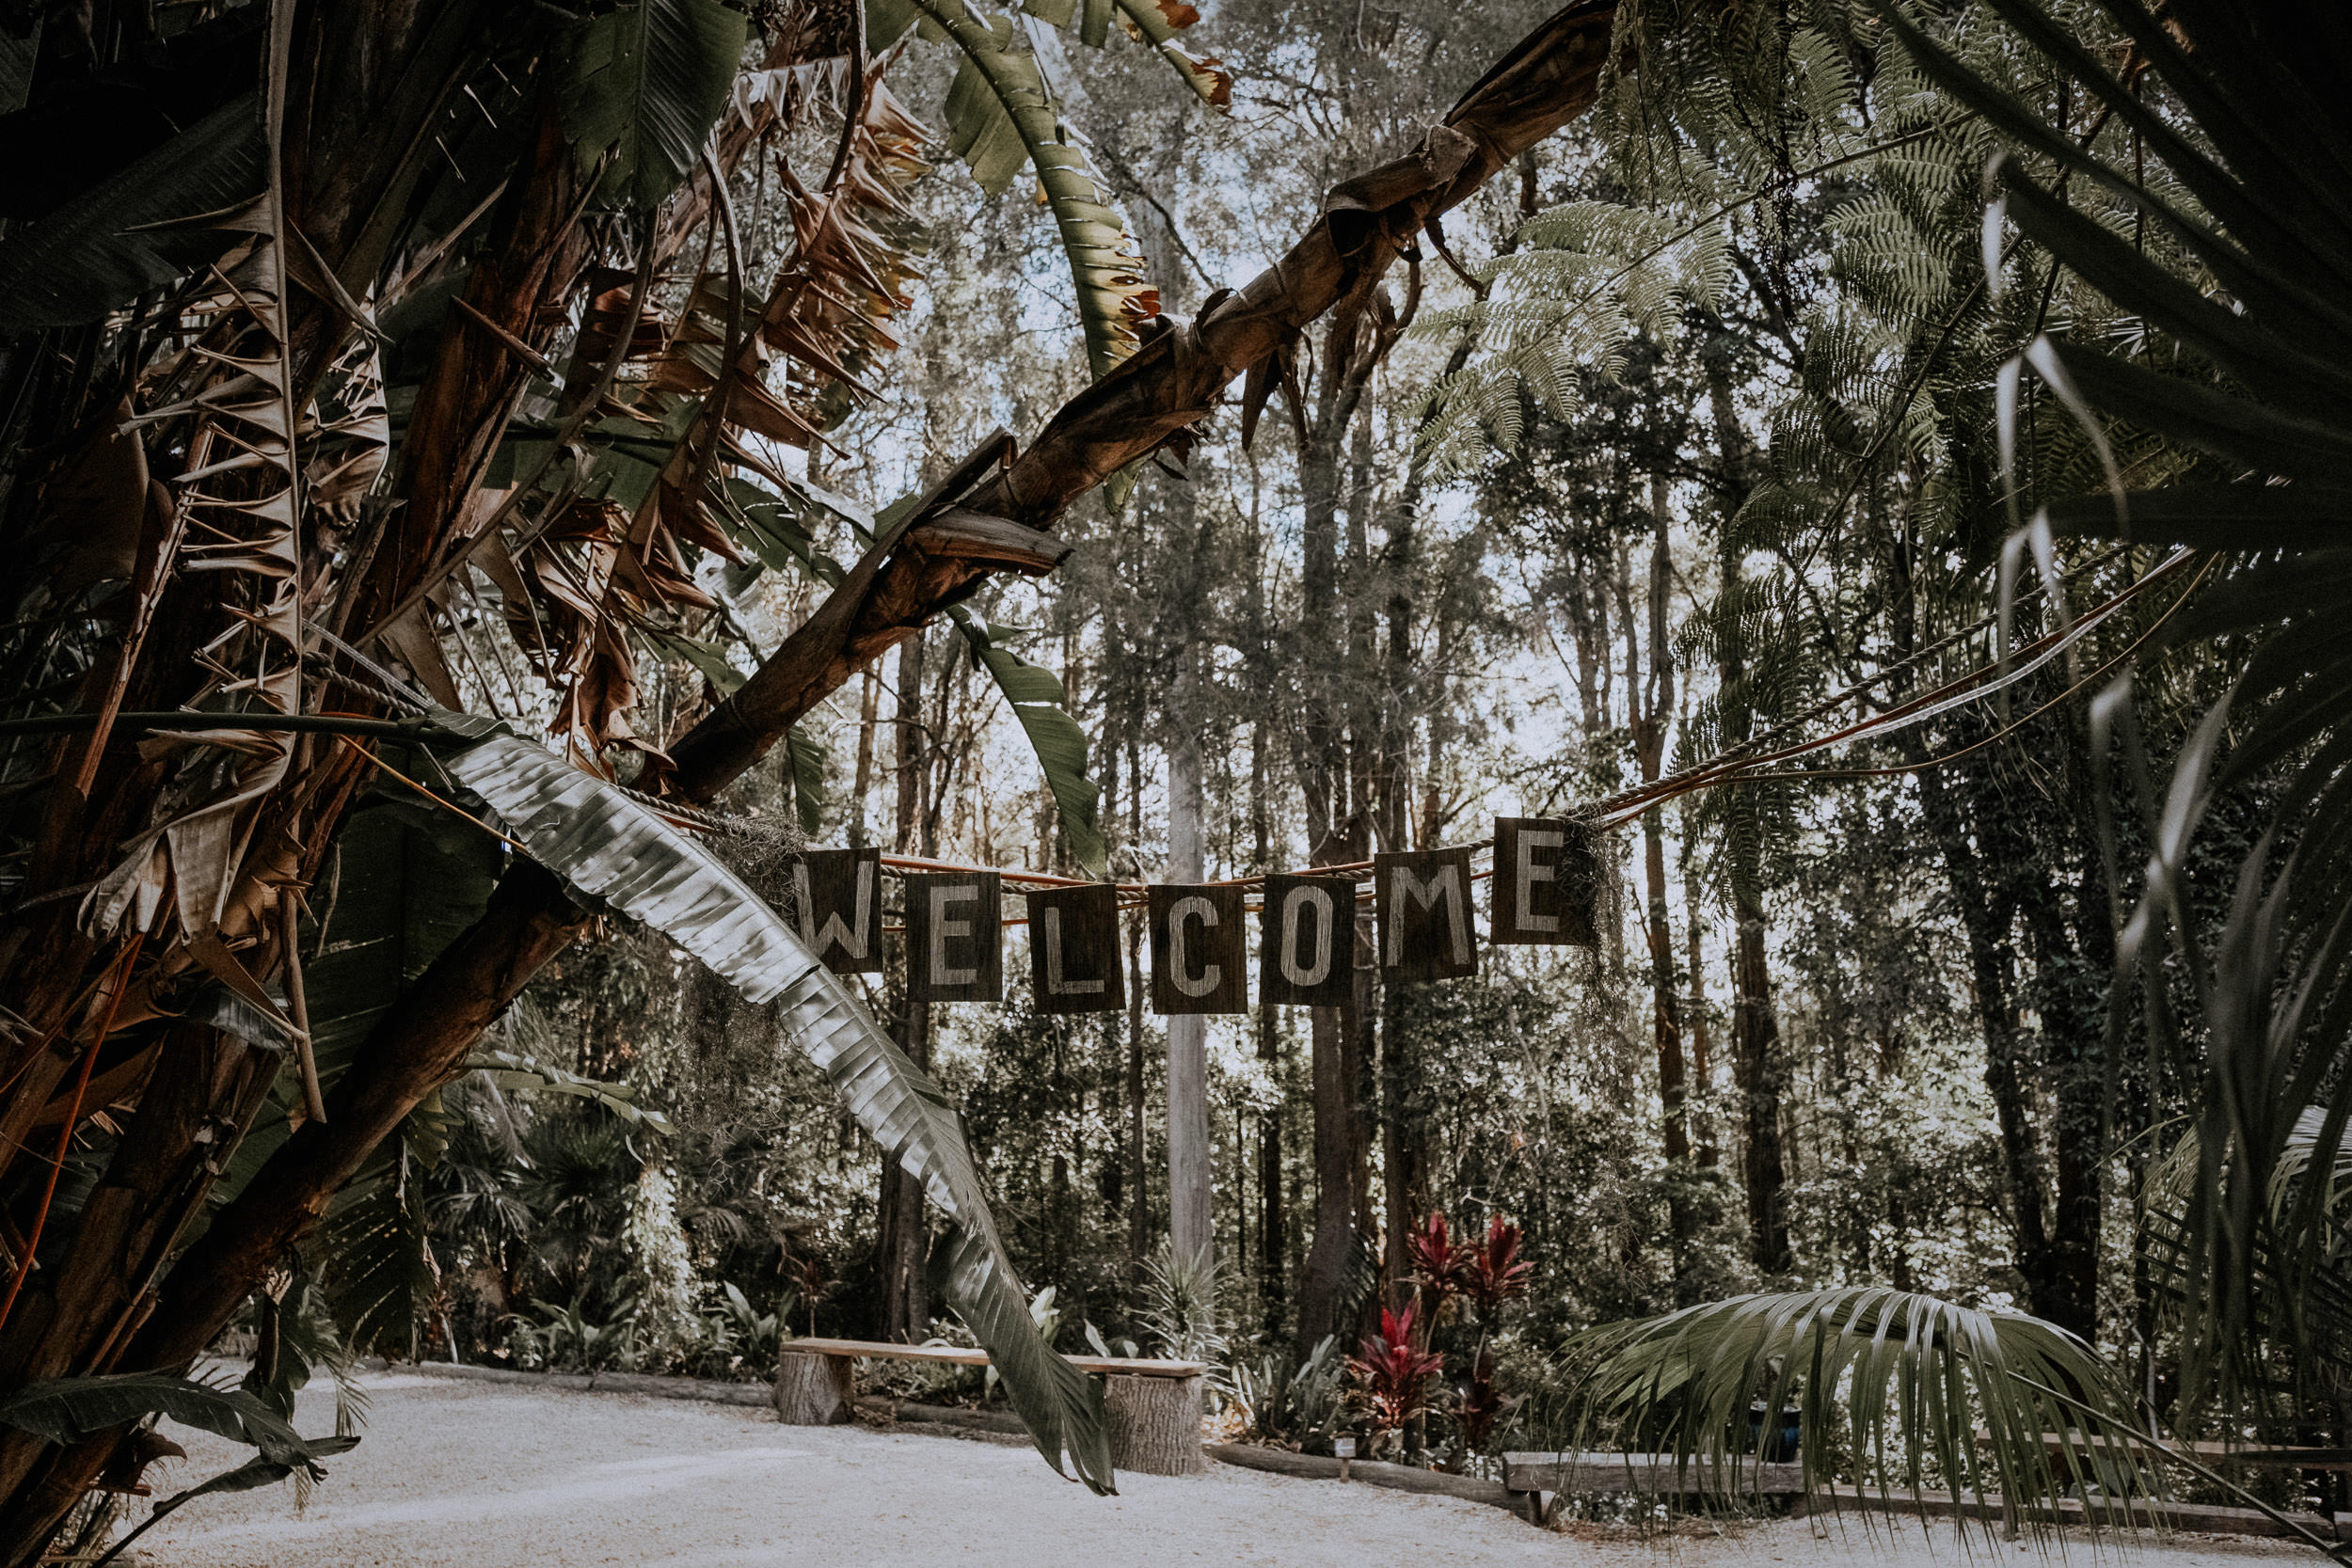 S&A Elopement - Kings & Thieves - Shred 'Til Dead - Central Coast Beach Forest Wedding - 138.jpg